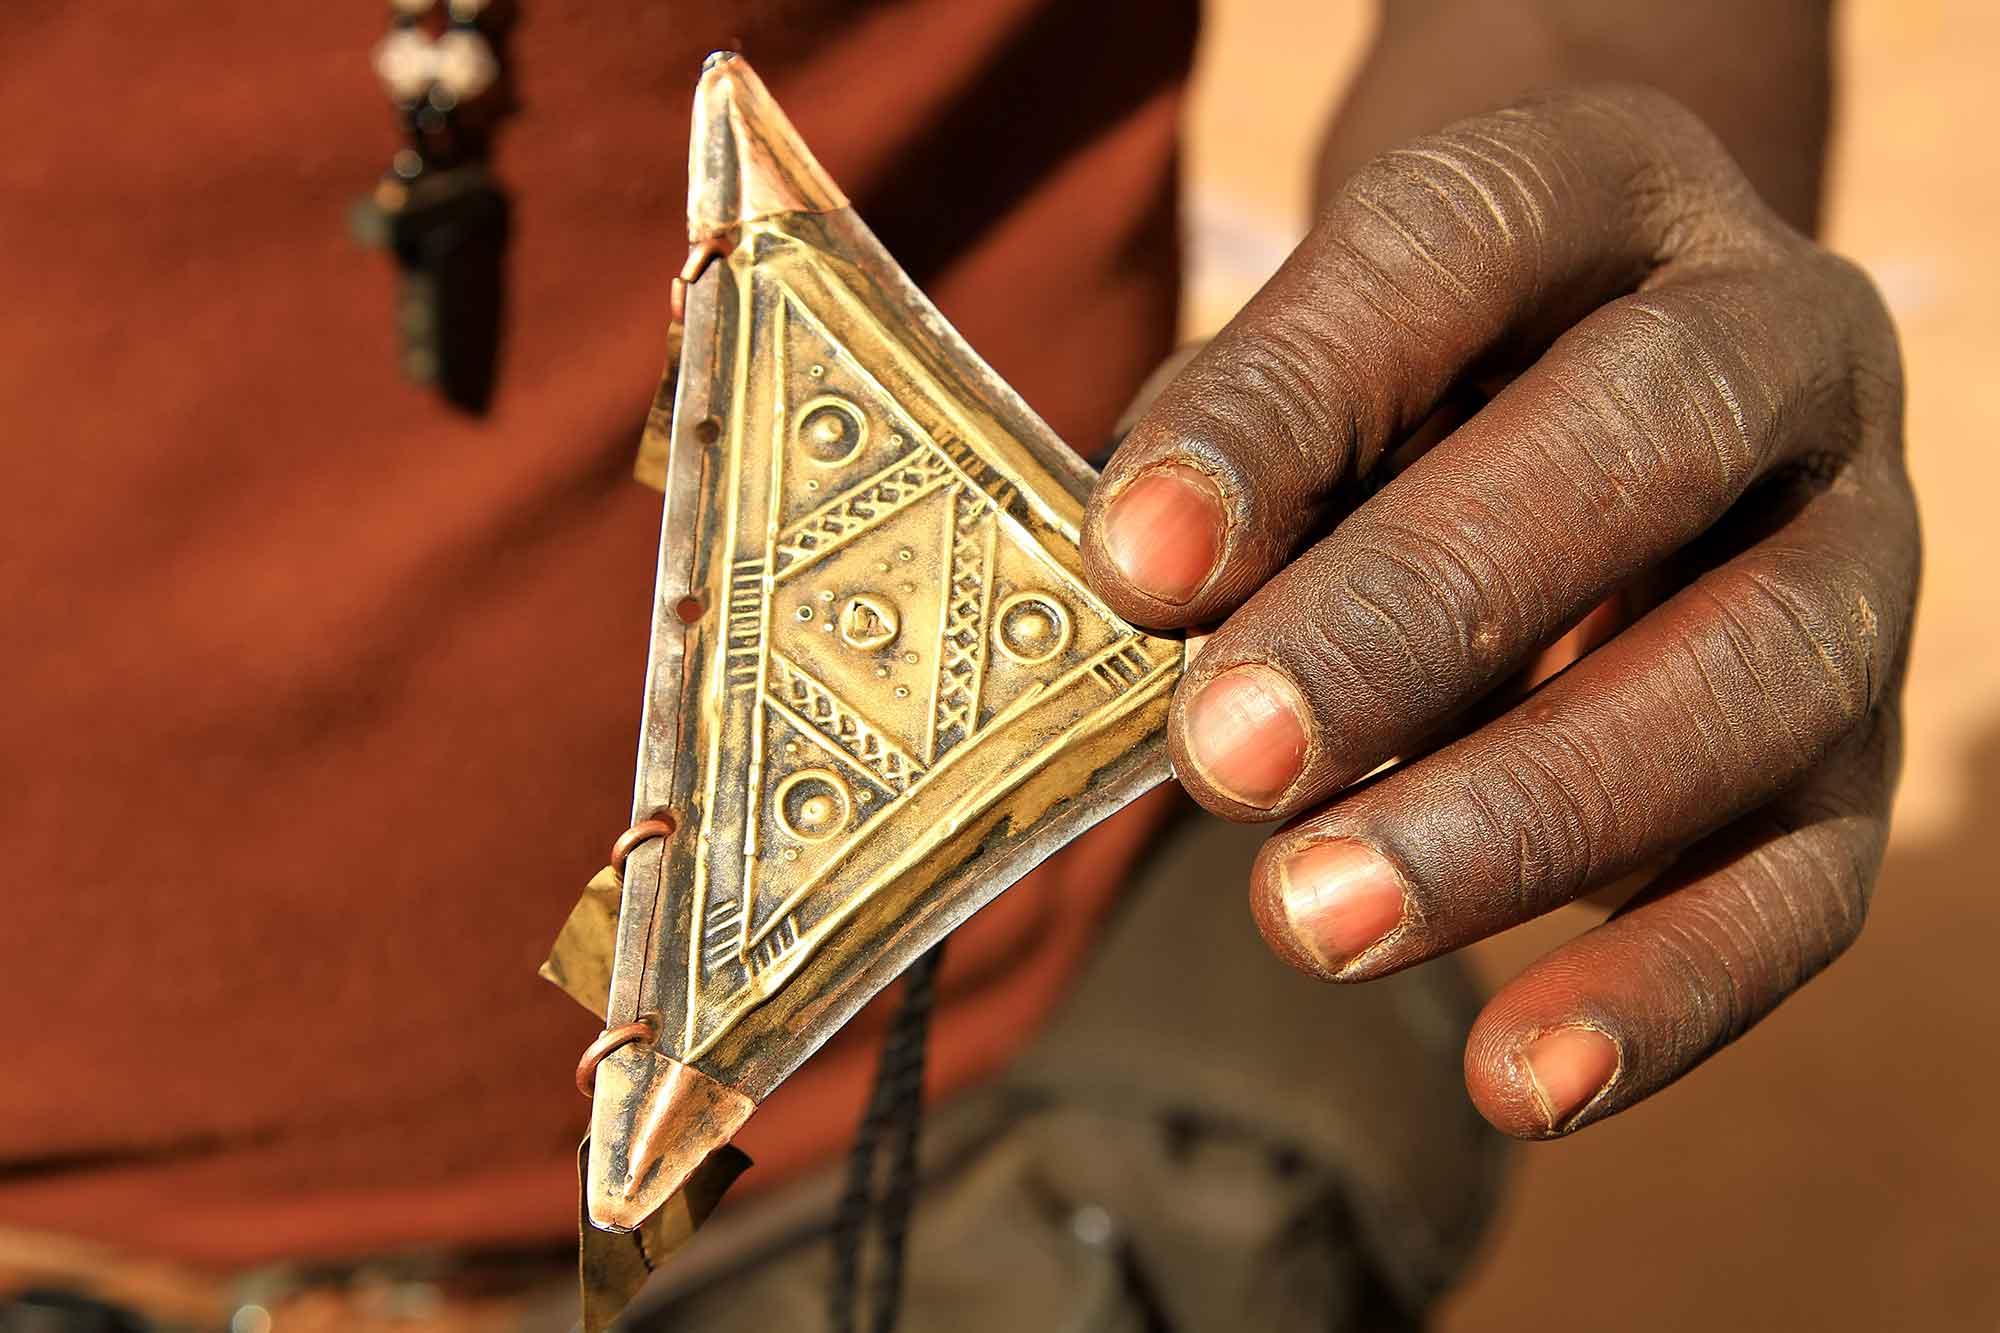 bukina-faso-ouagadougou-man-selling-goods